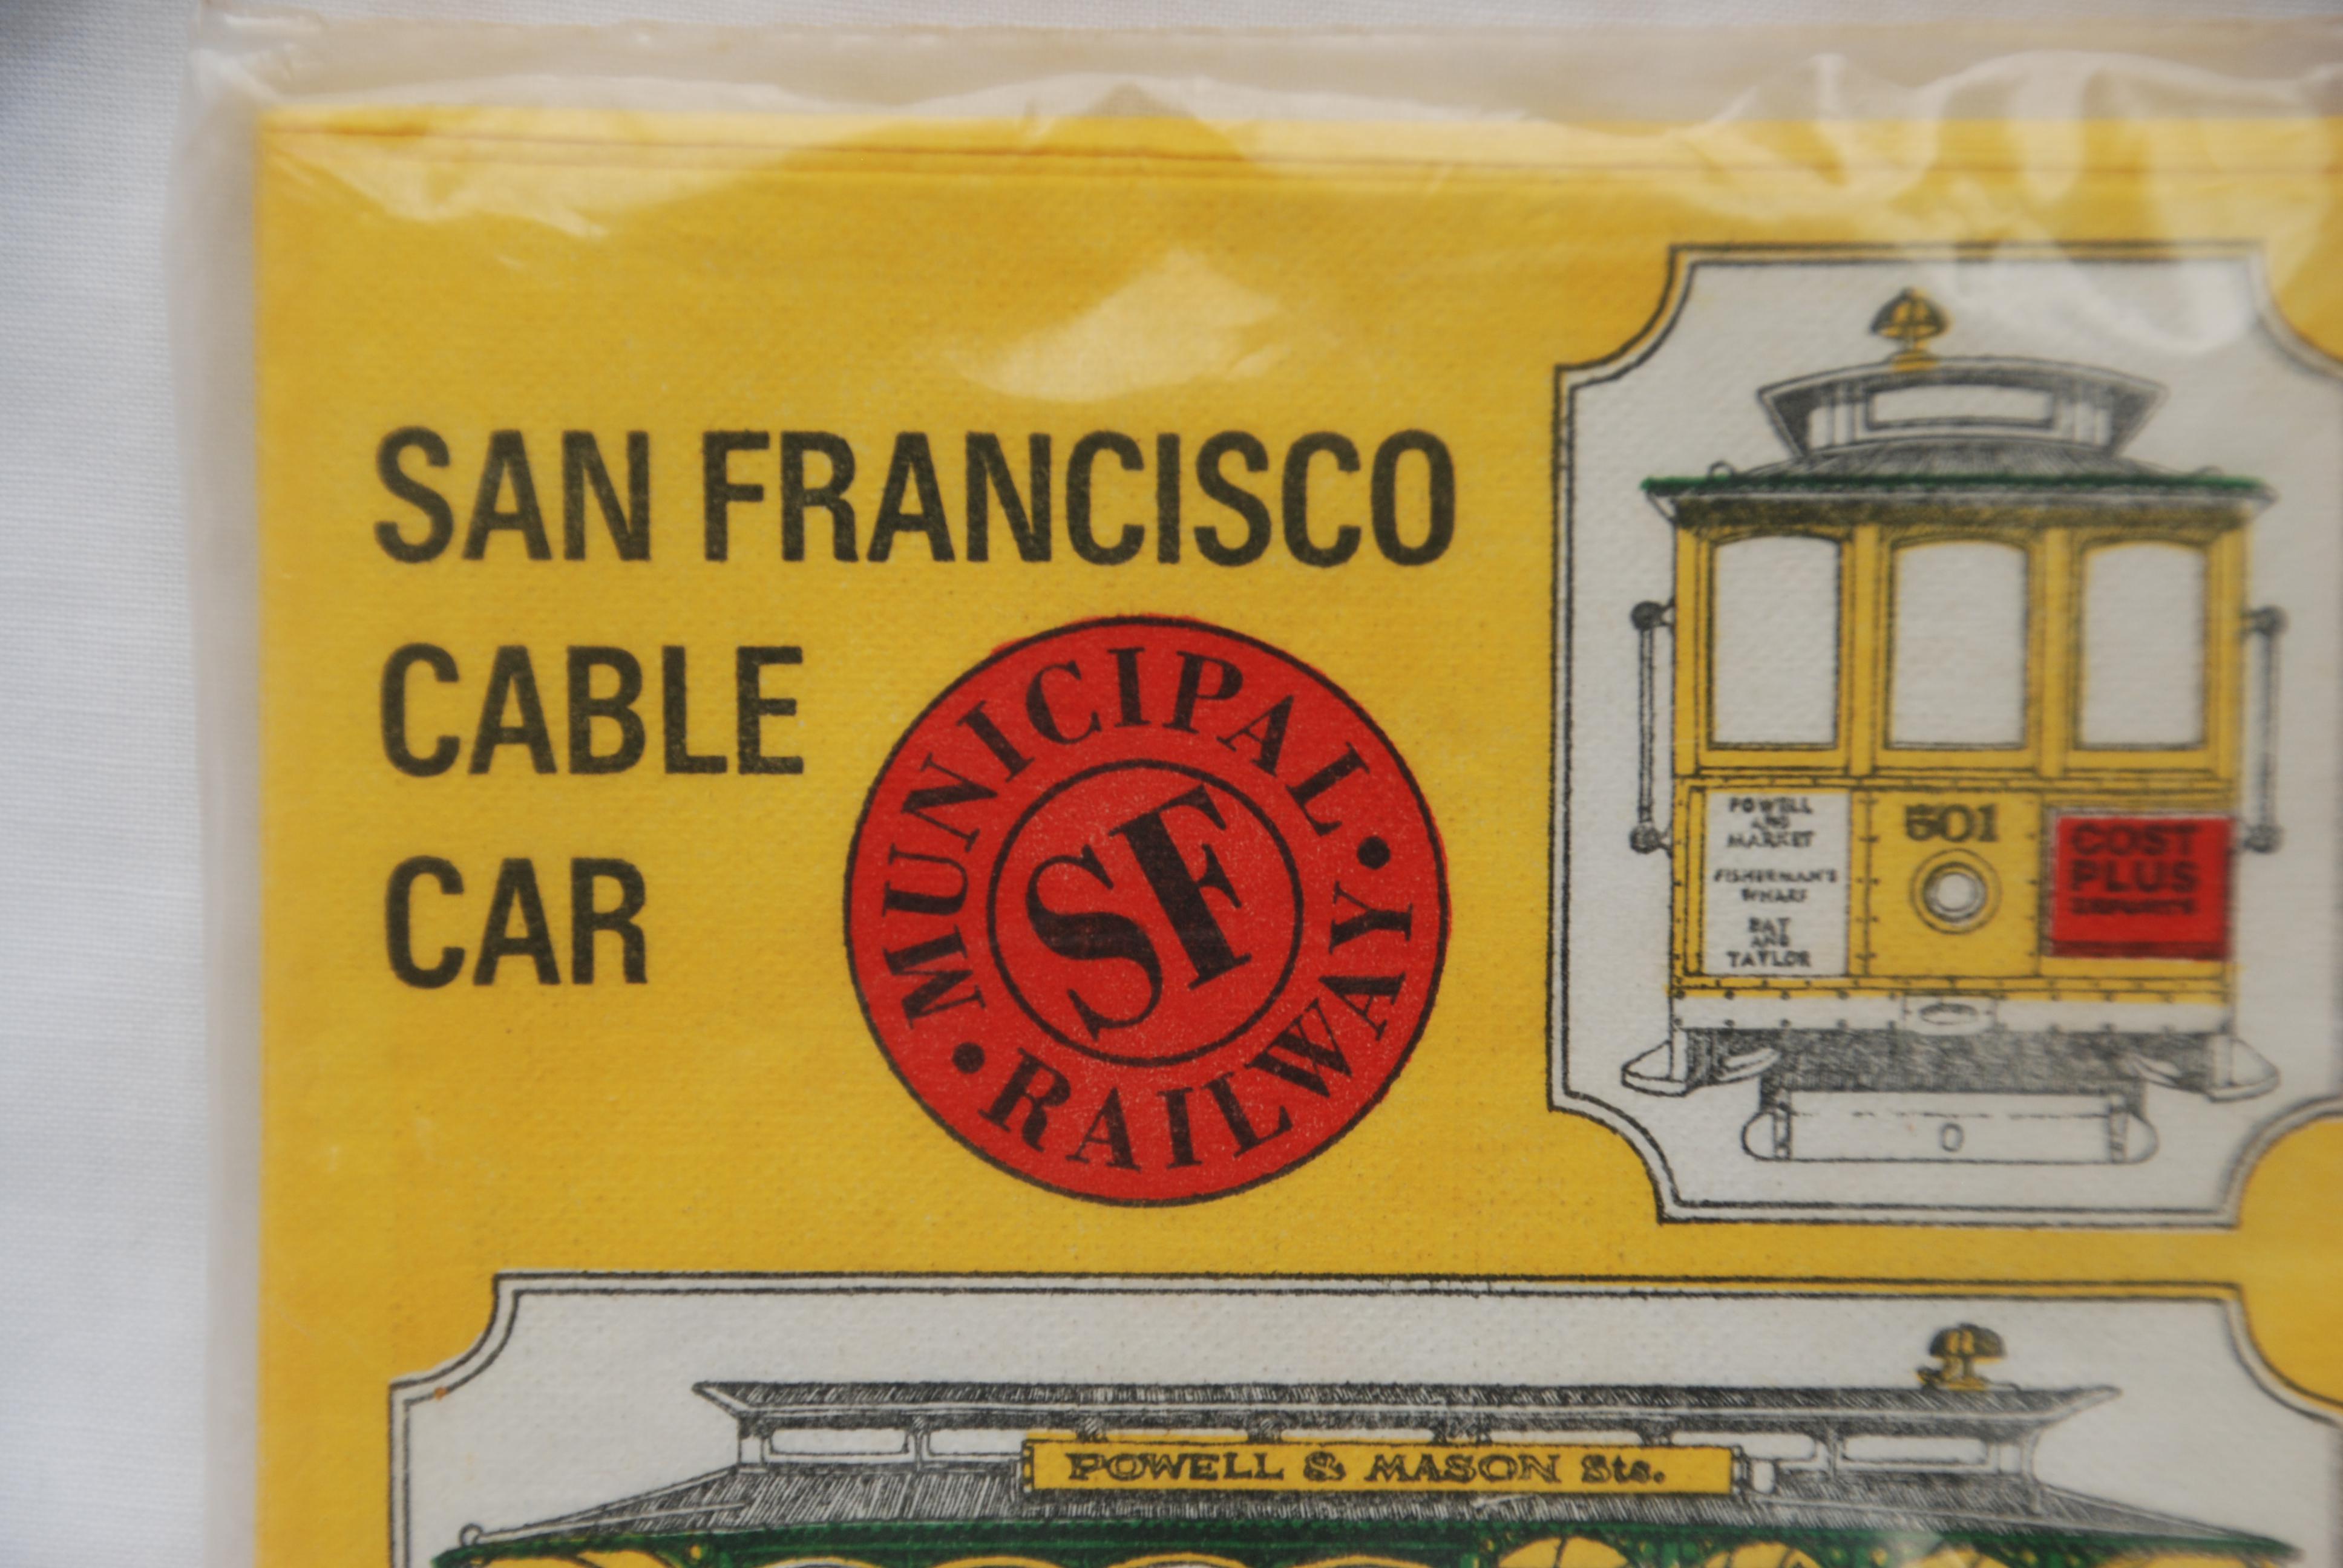 Vintage San Francisco Cable Car Paper Napkins   Set Of 24   Image 4 Of 6